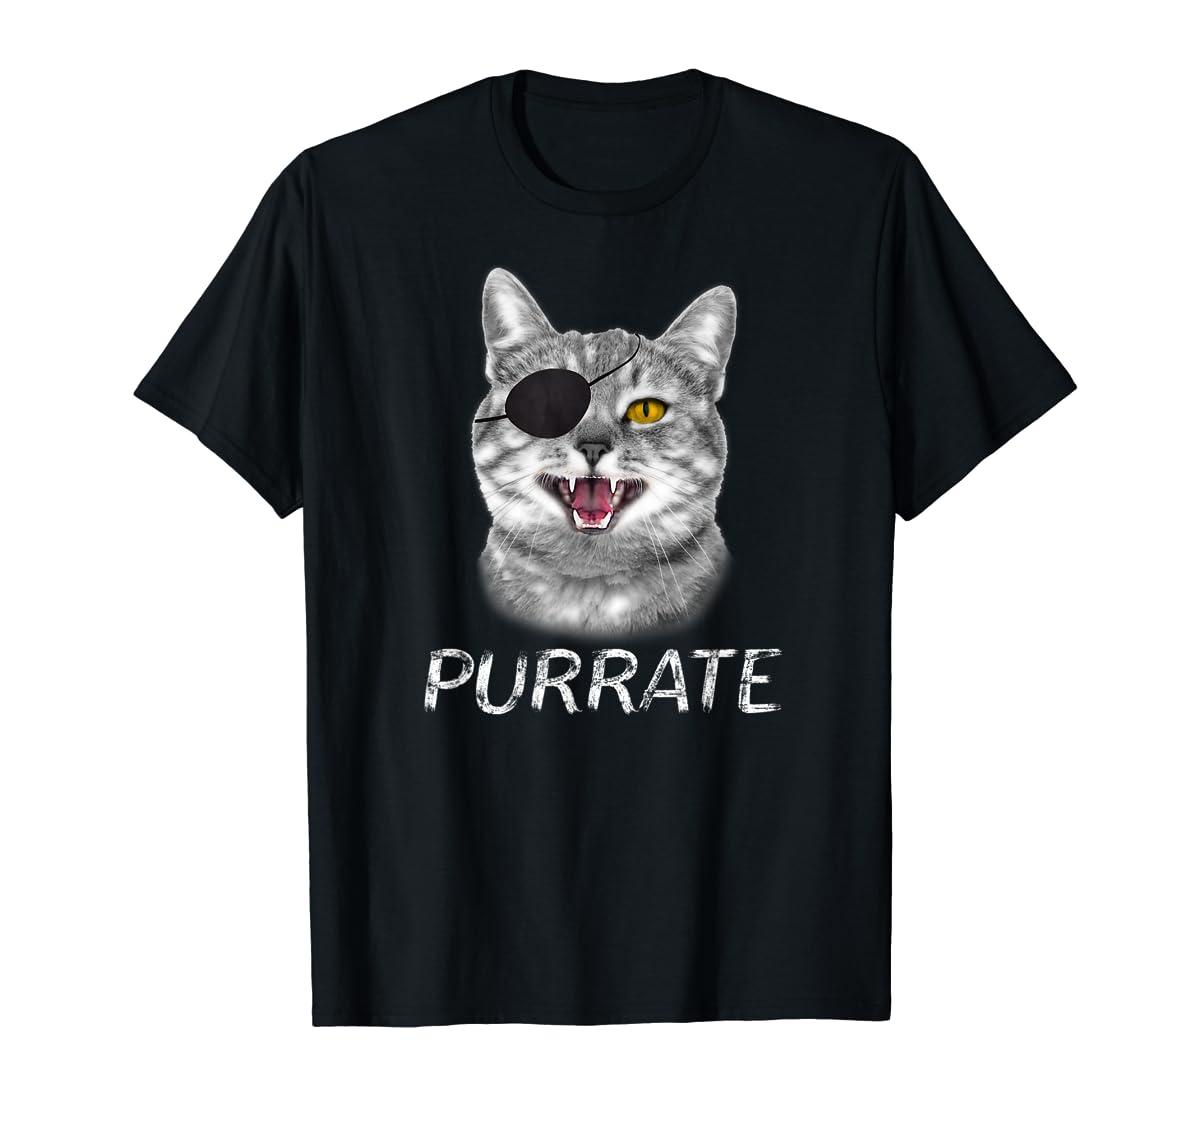 Halloween Trick Treat Cat Pirate Purrate T-Shirt-Men's T-Shirt-Black